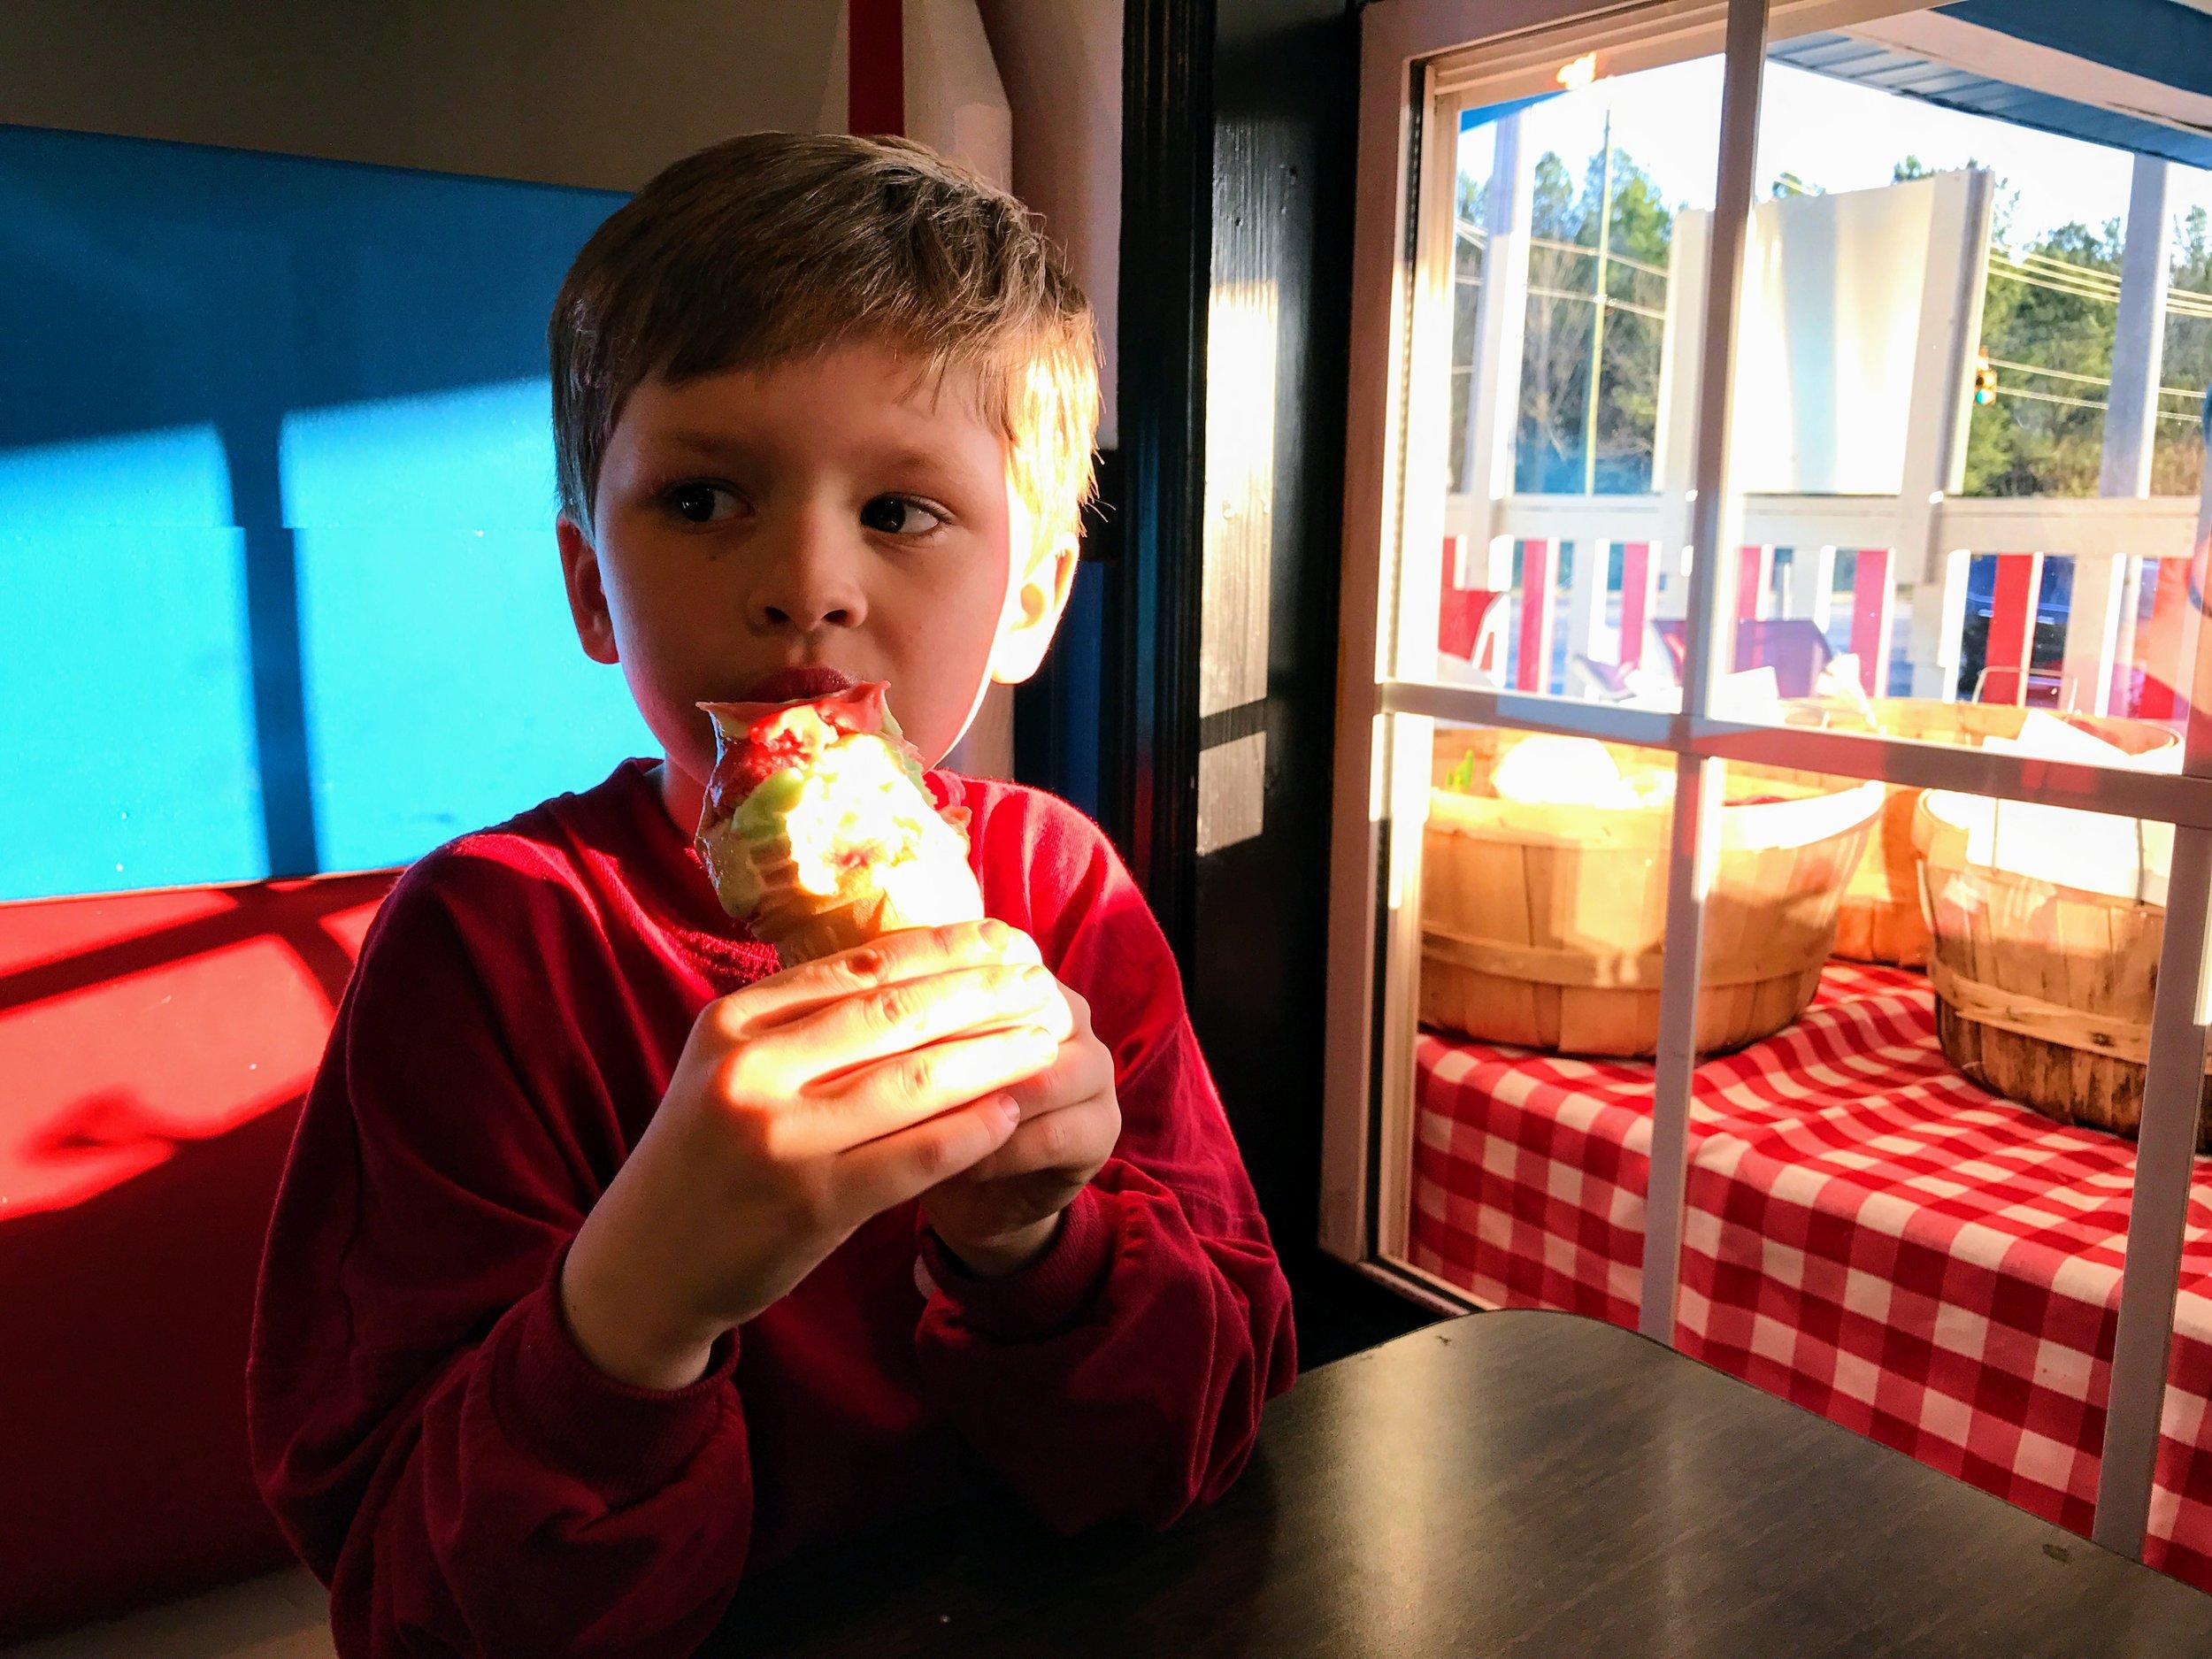 Friday ice cream dates at Ingram Farms